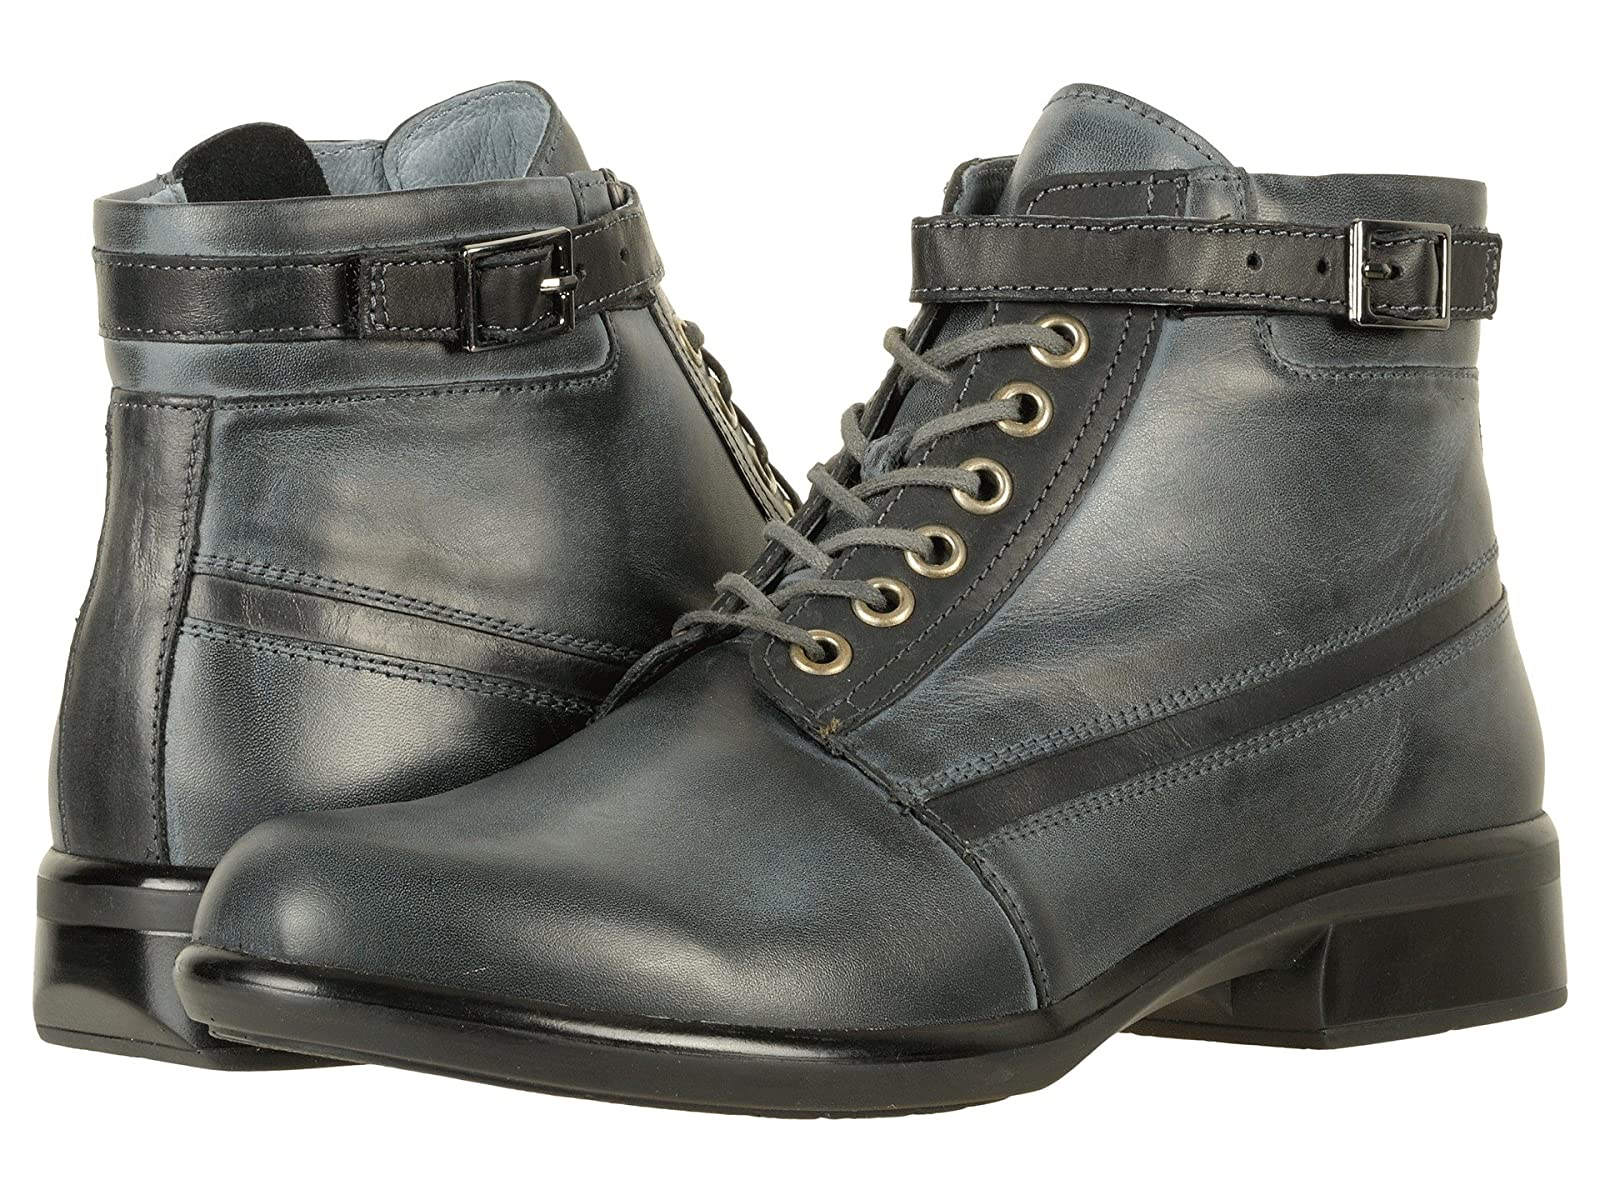 Naot KonaEconomical and quality shoes